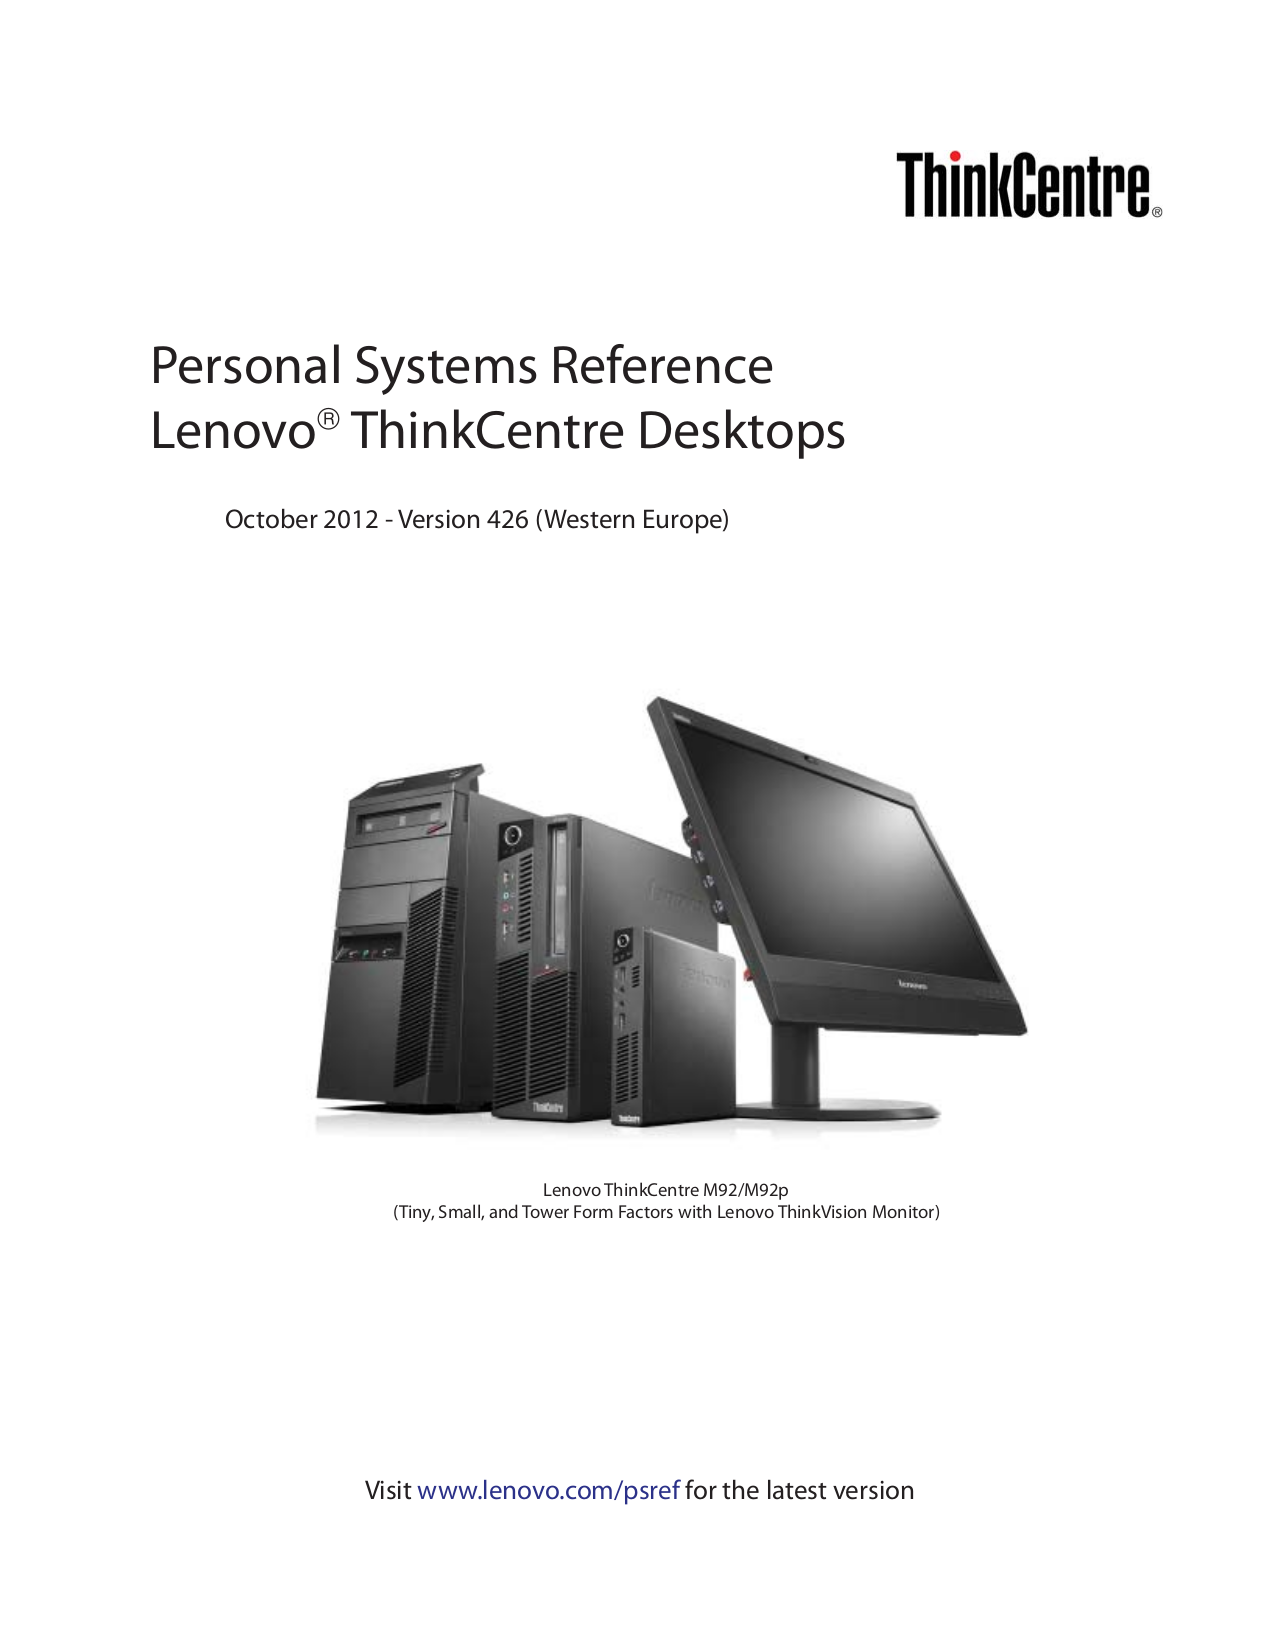 pdf for Lenovo Desktop ThinkCentre M81 1730 manual